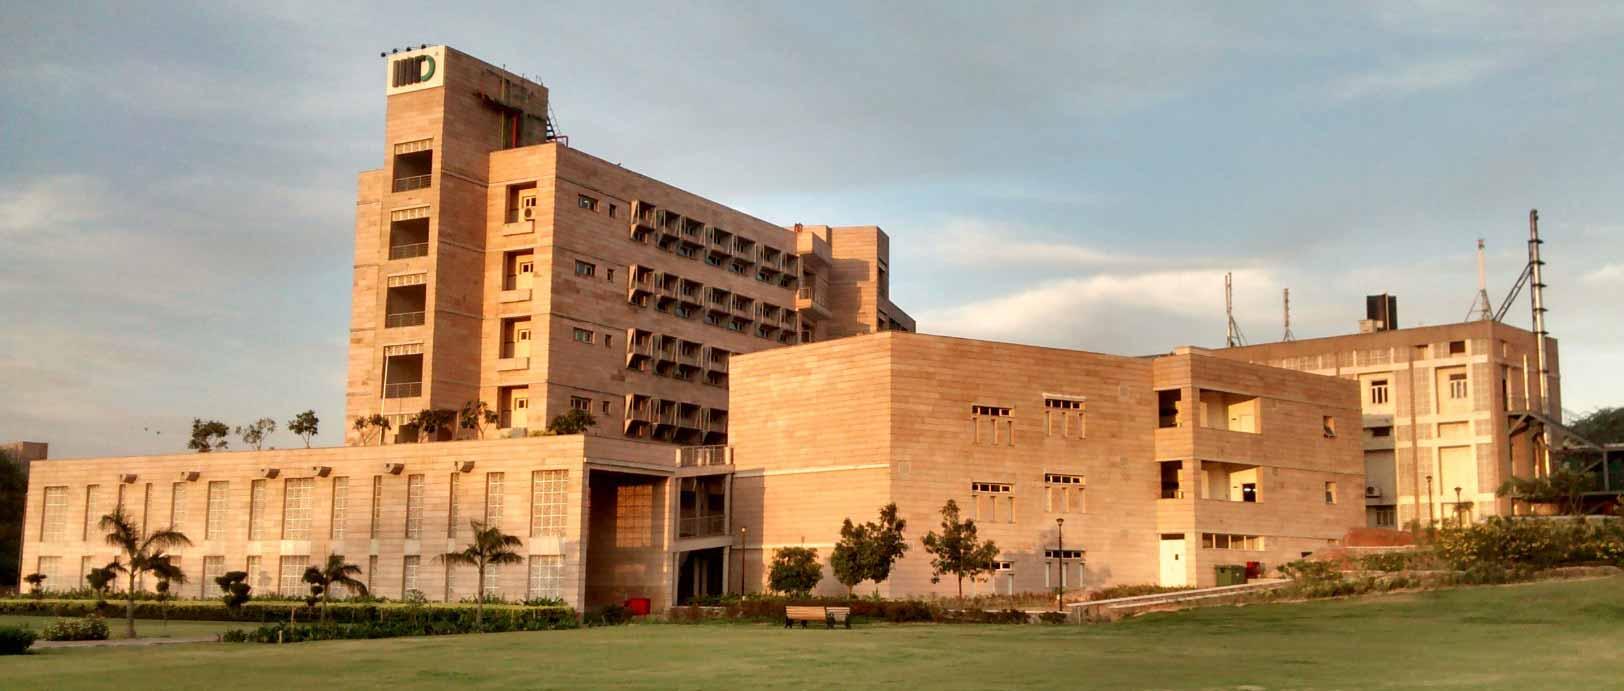 IIIT Delhi Admission 2021-22: Courses, Fees, Cutoff